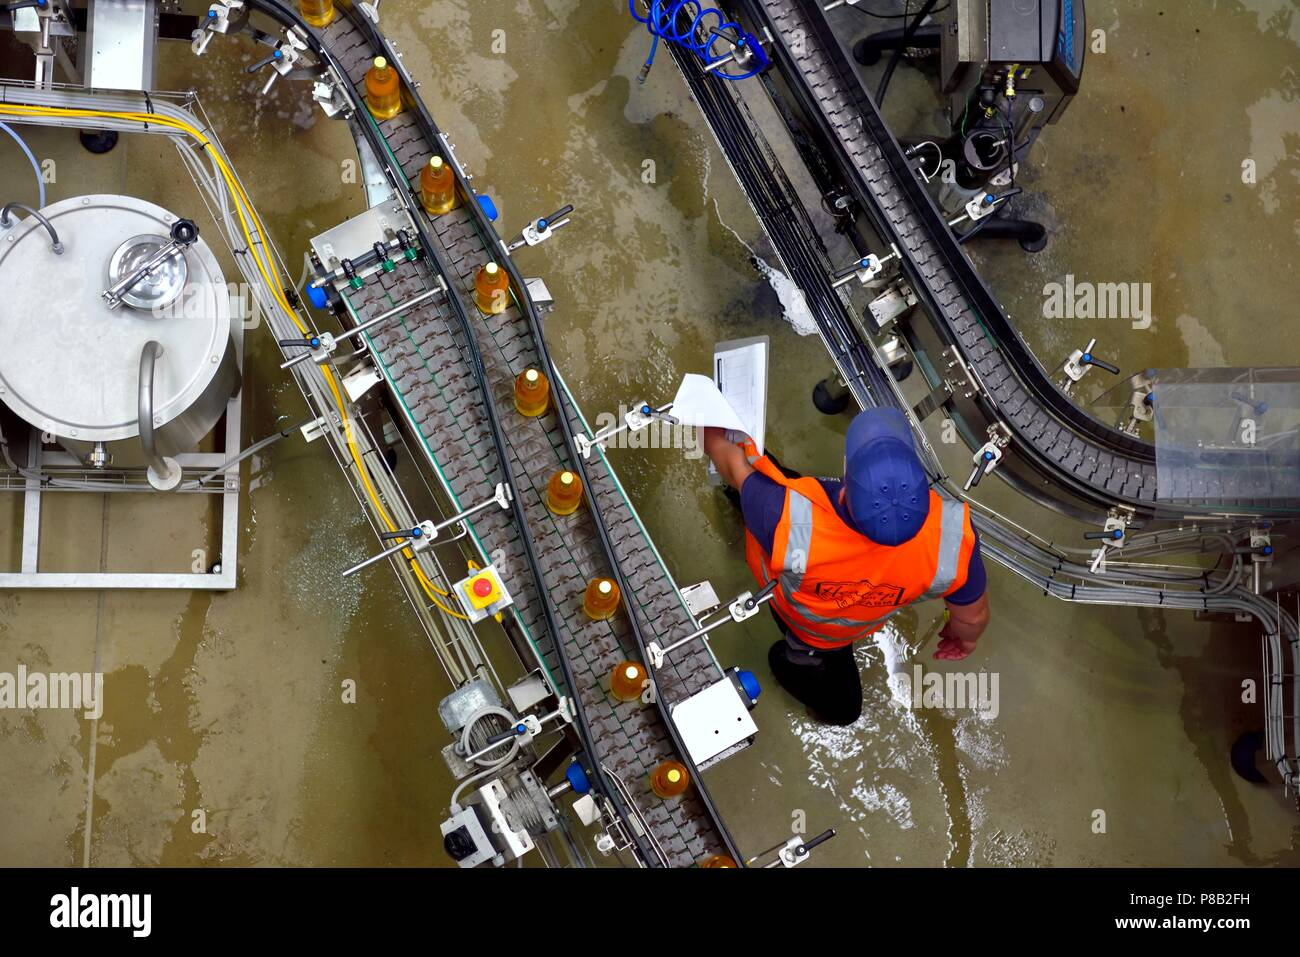 Man working on ,Bottling production line, Healeys Cornish Cyder Farm,Penhallow, Truro,Cornwall,England,UK Stock Photo